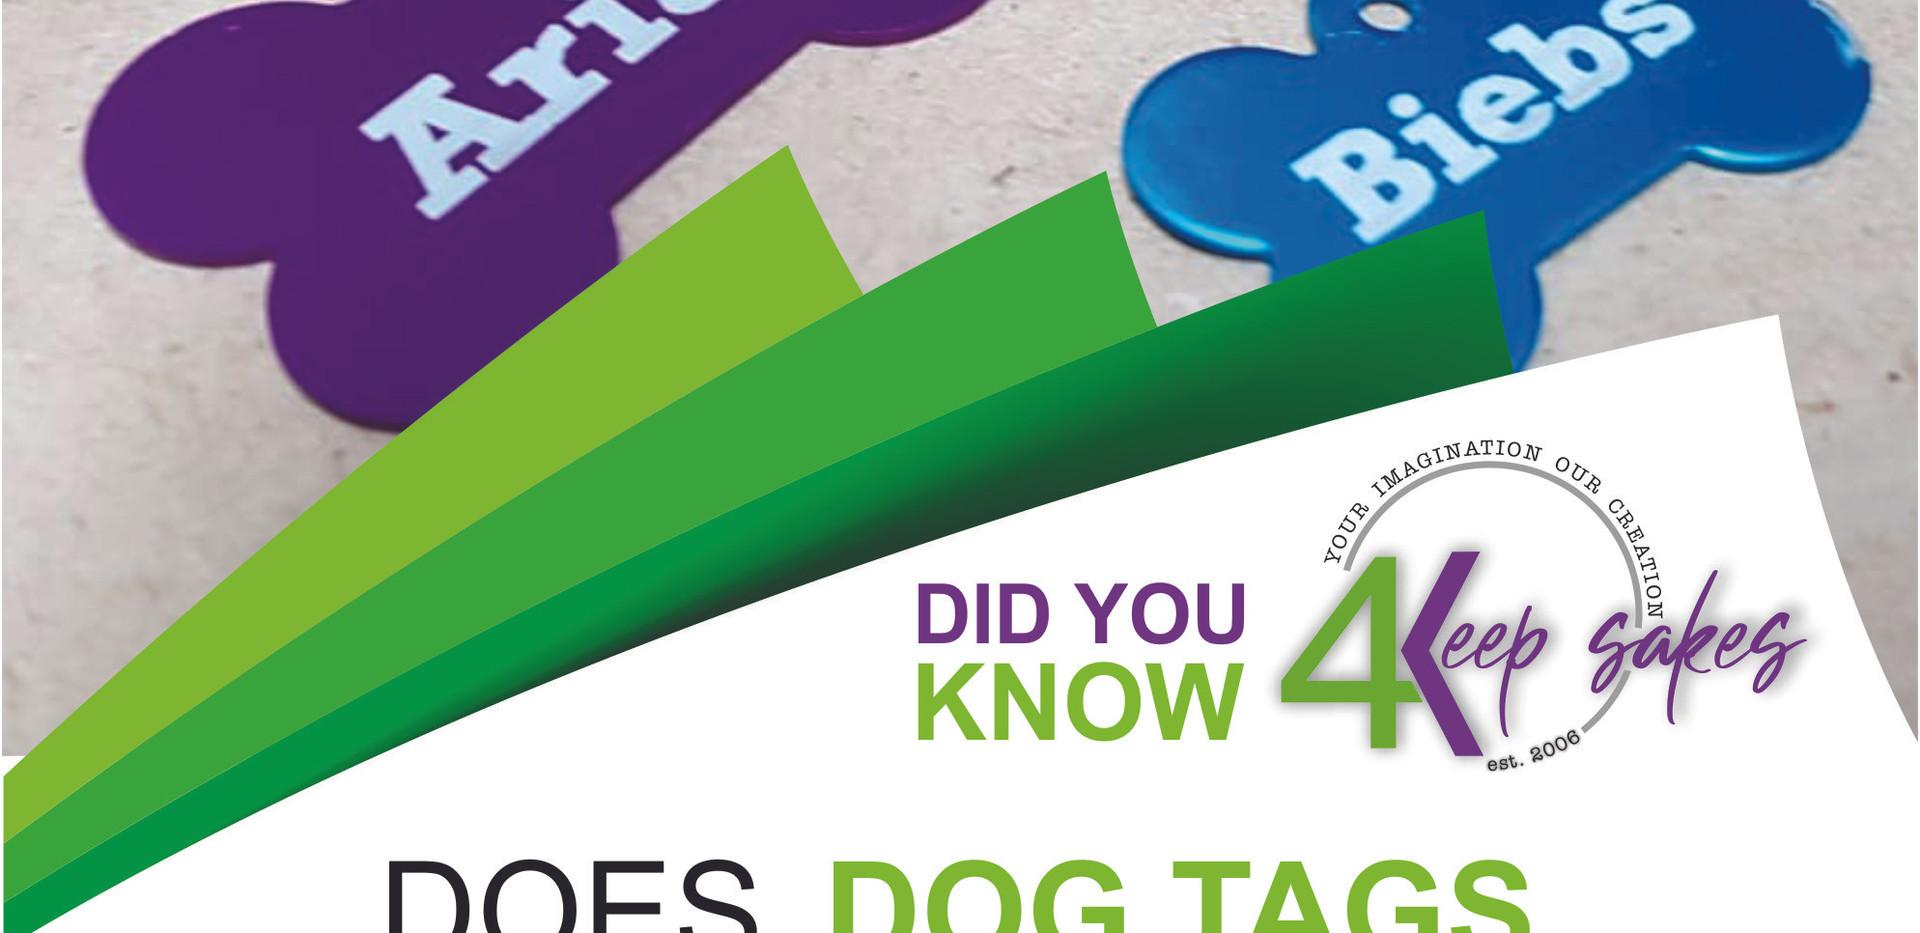 Did you know 4keepsake dog tags.jpg